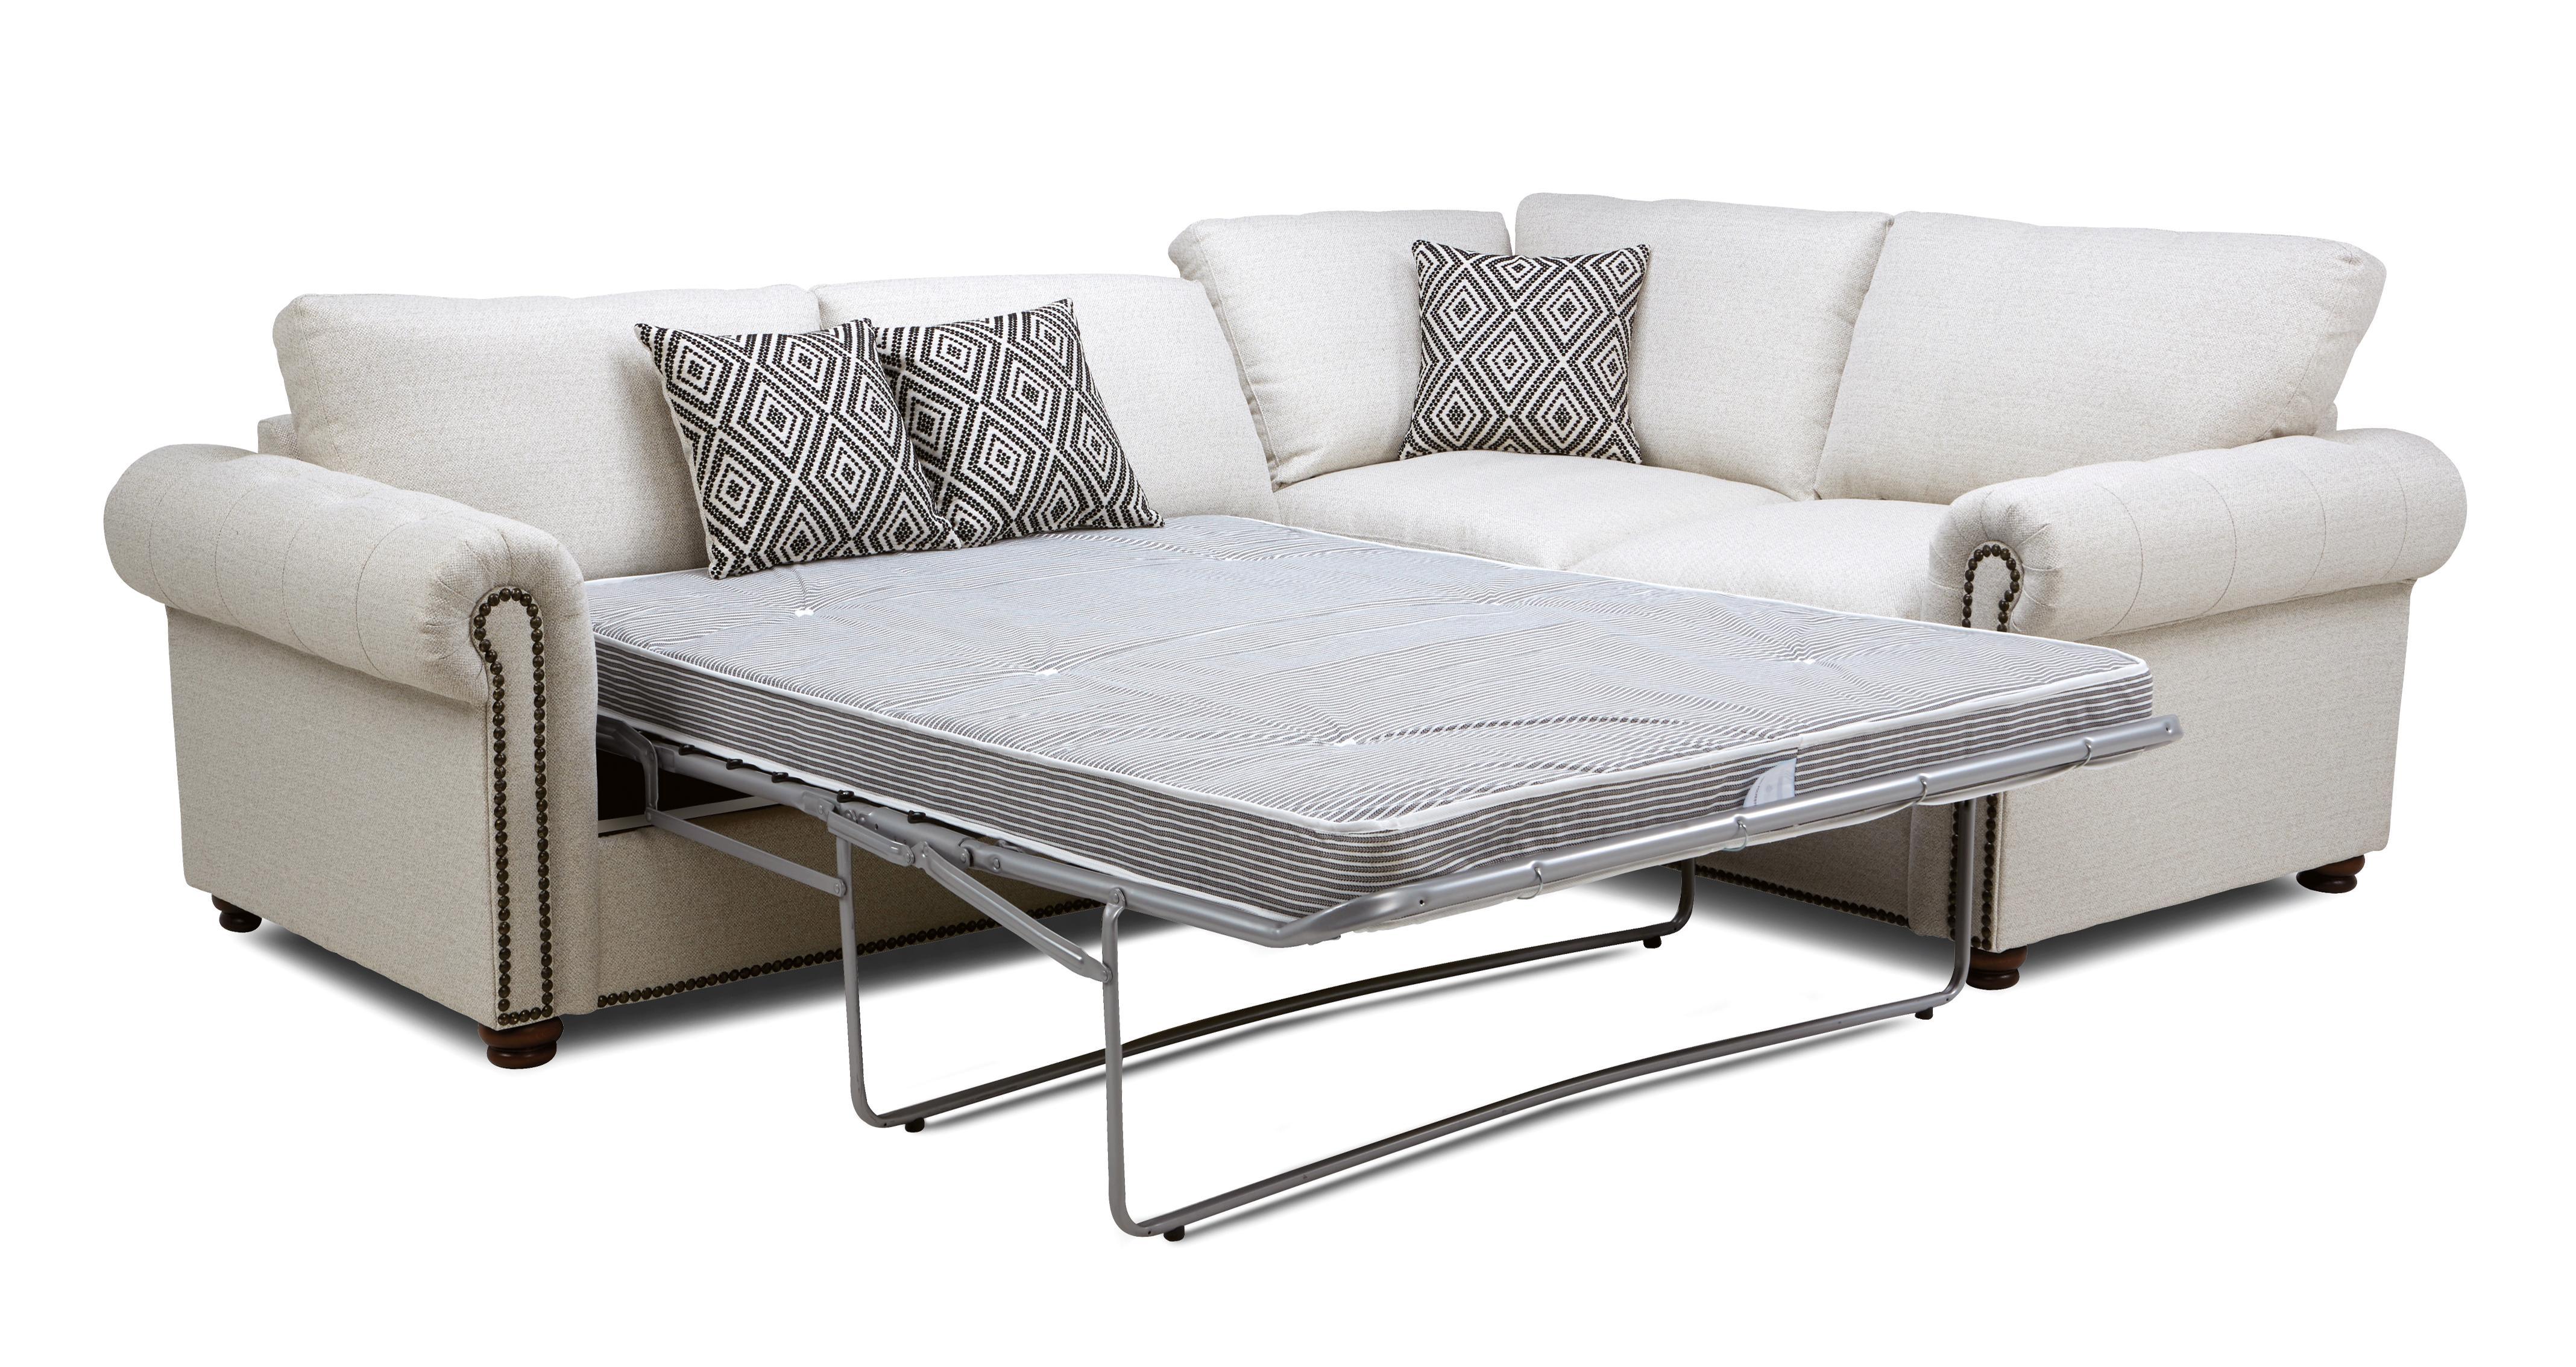 dfs moray sofa reviews full bed sheet set oakland grey review home co